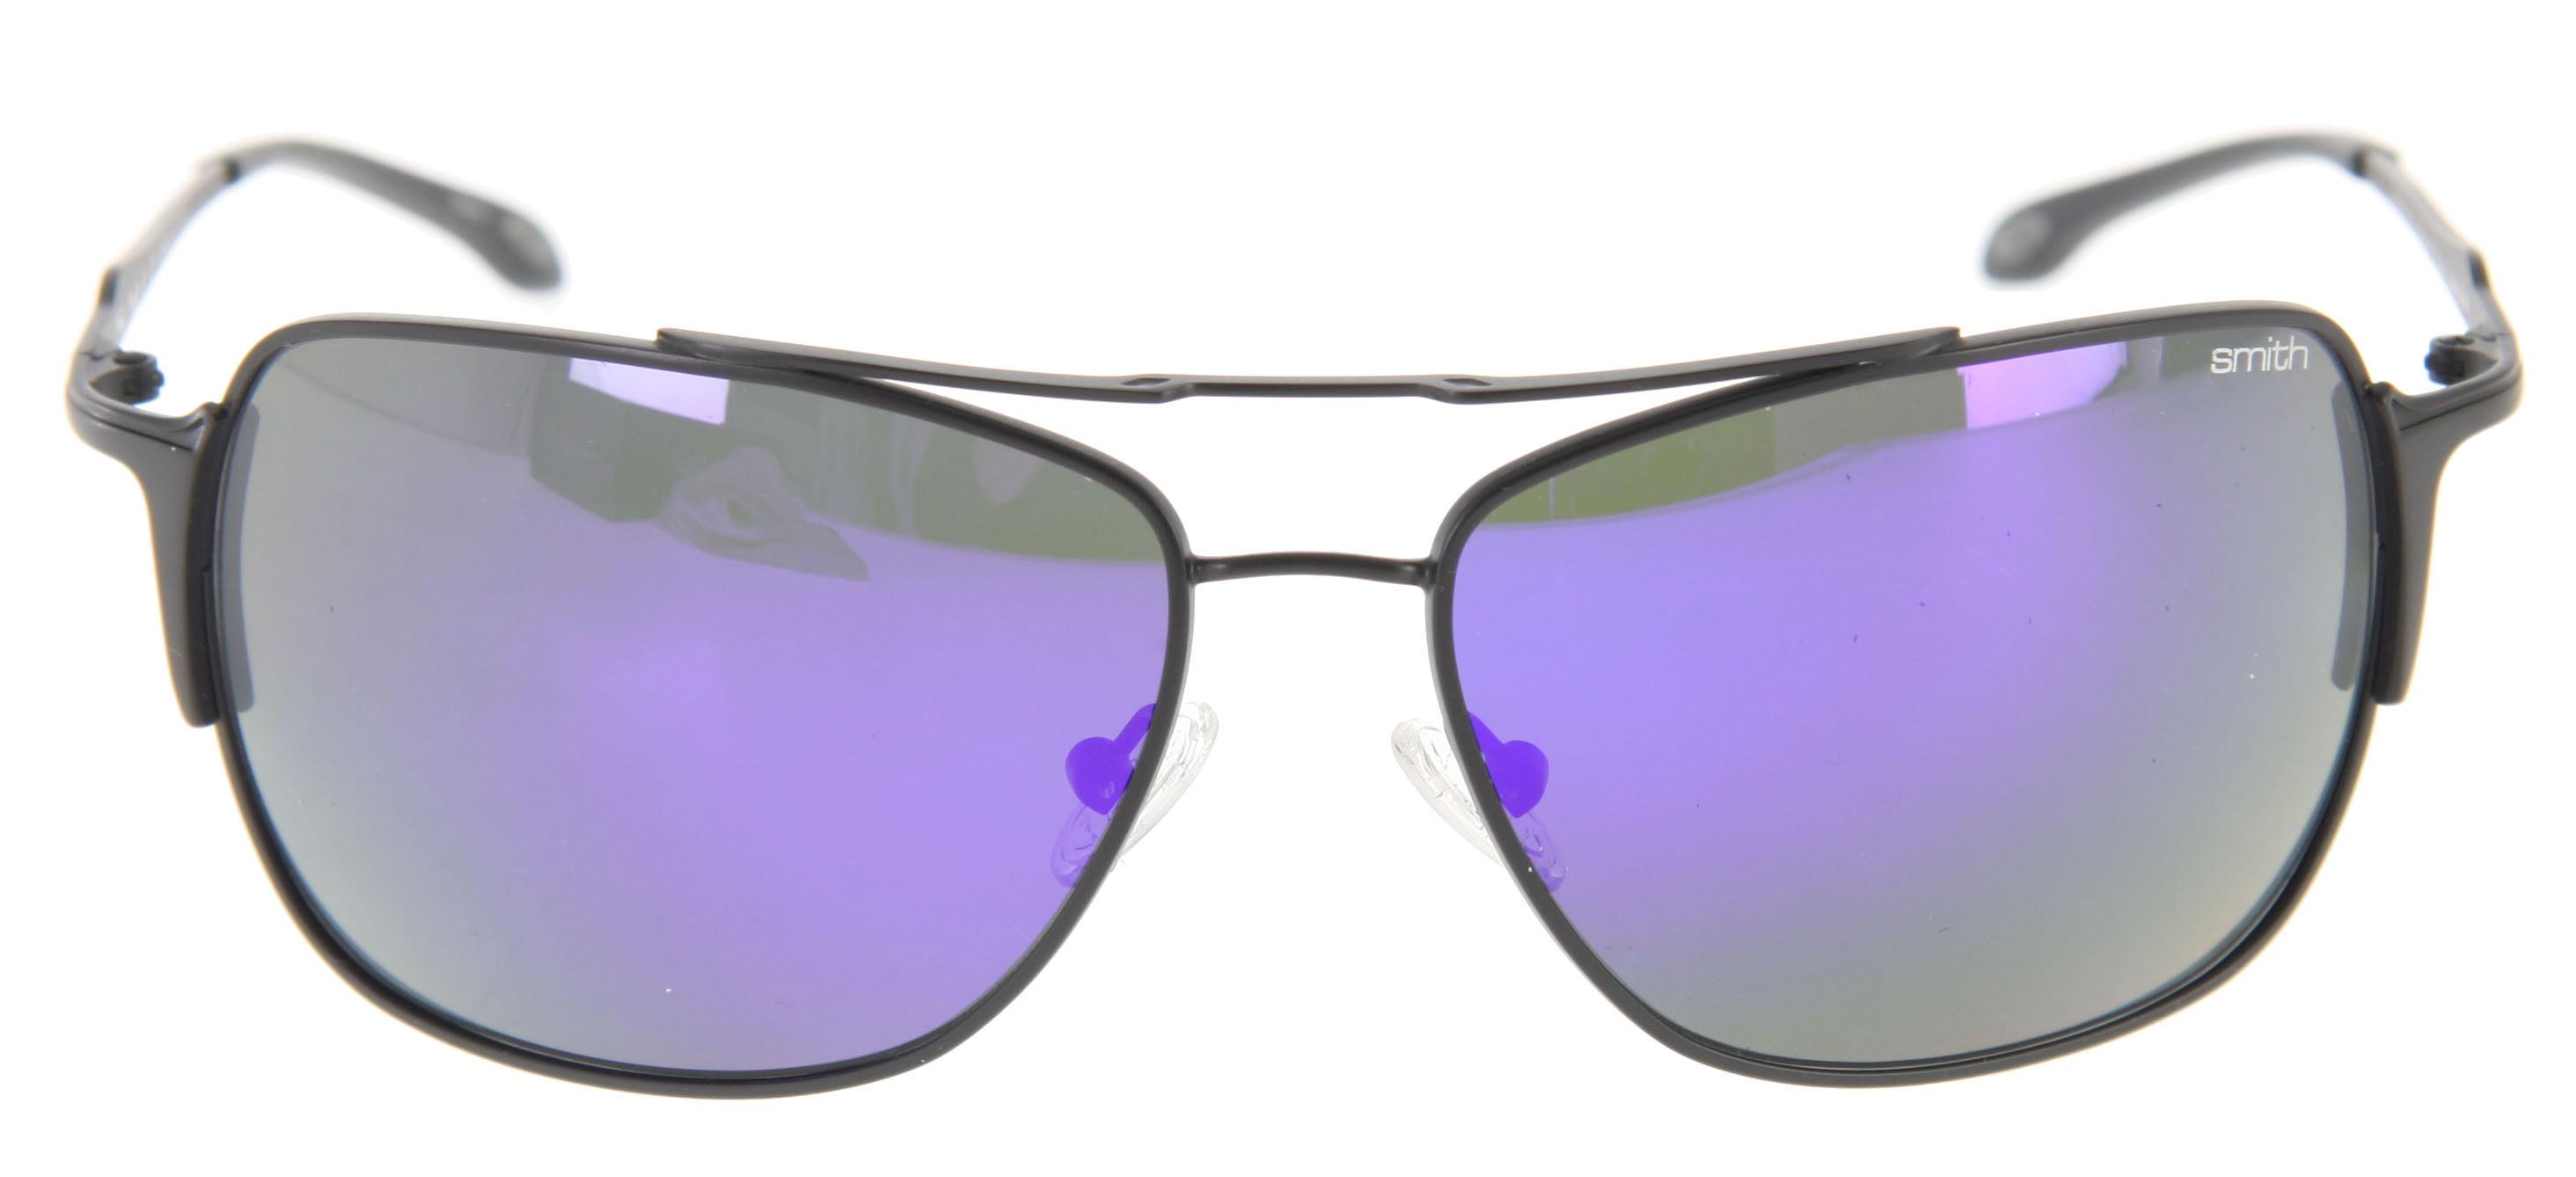 b6d8c513e0 Smith Rosewood Sunglasses - thumbnail 3